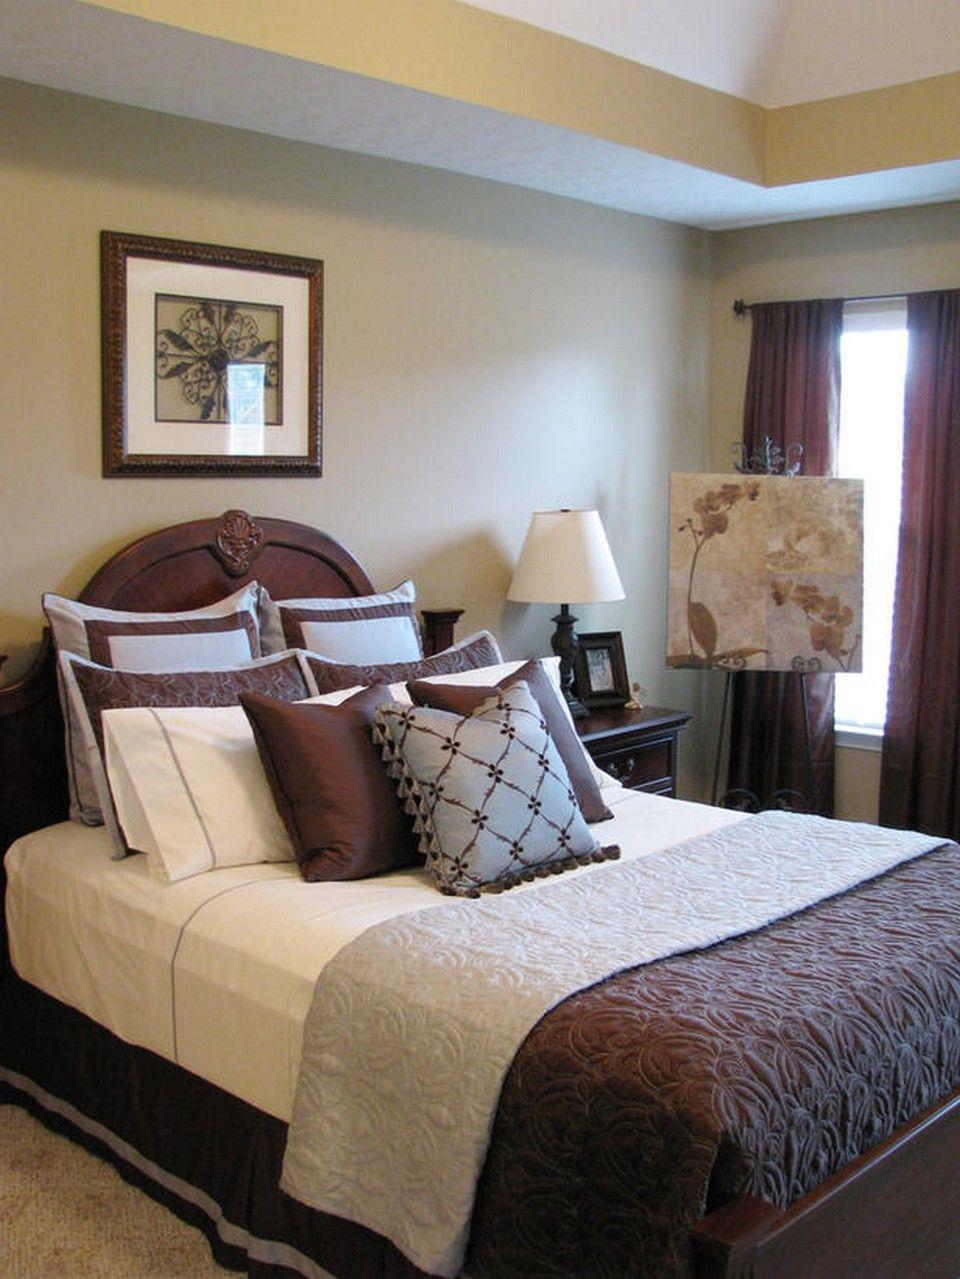 95 Brilliant Romantic Bedroom Design Ideas On A Budget Master